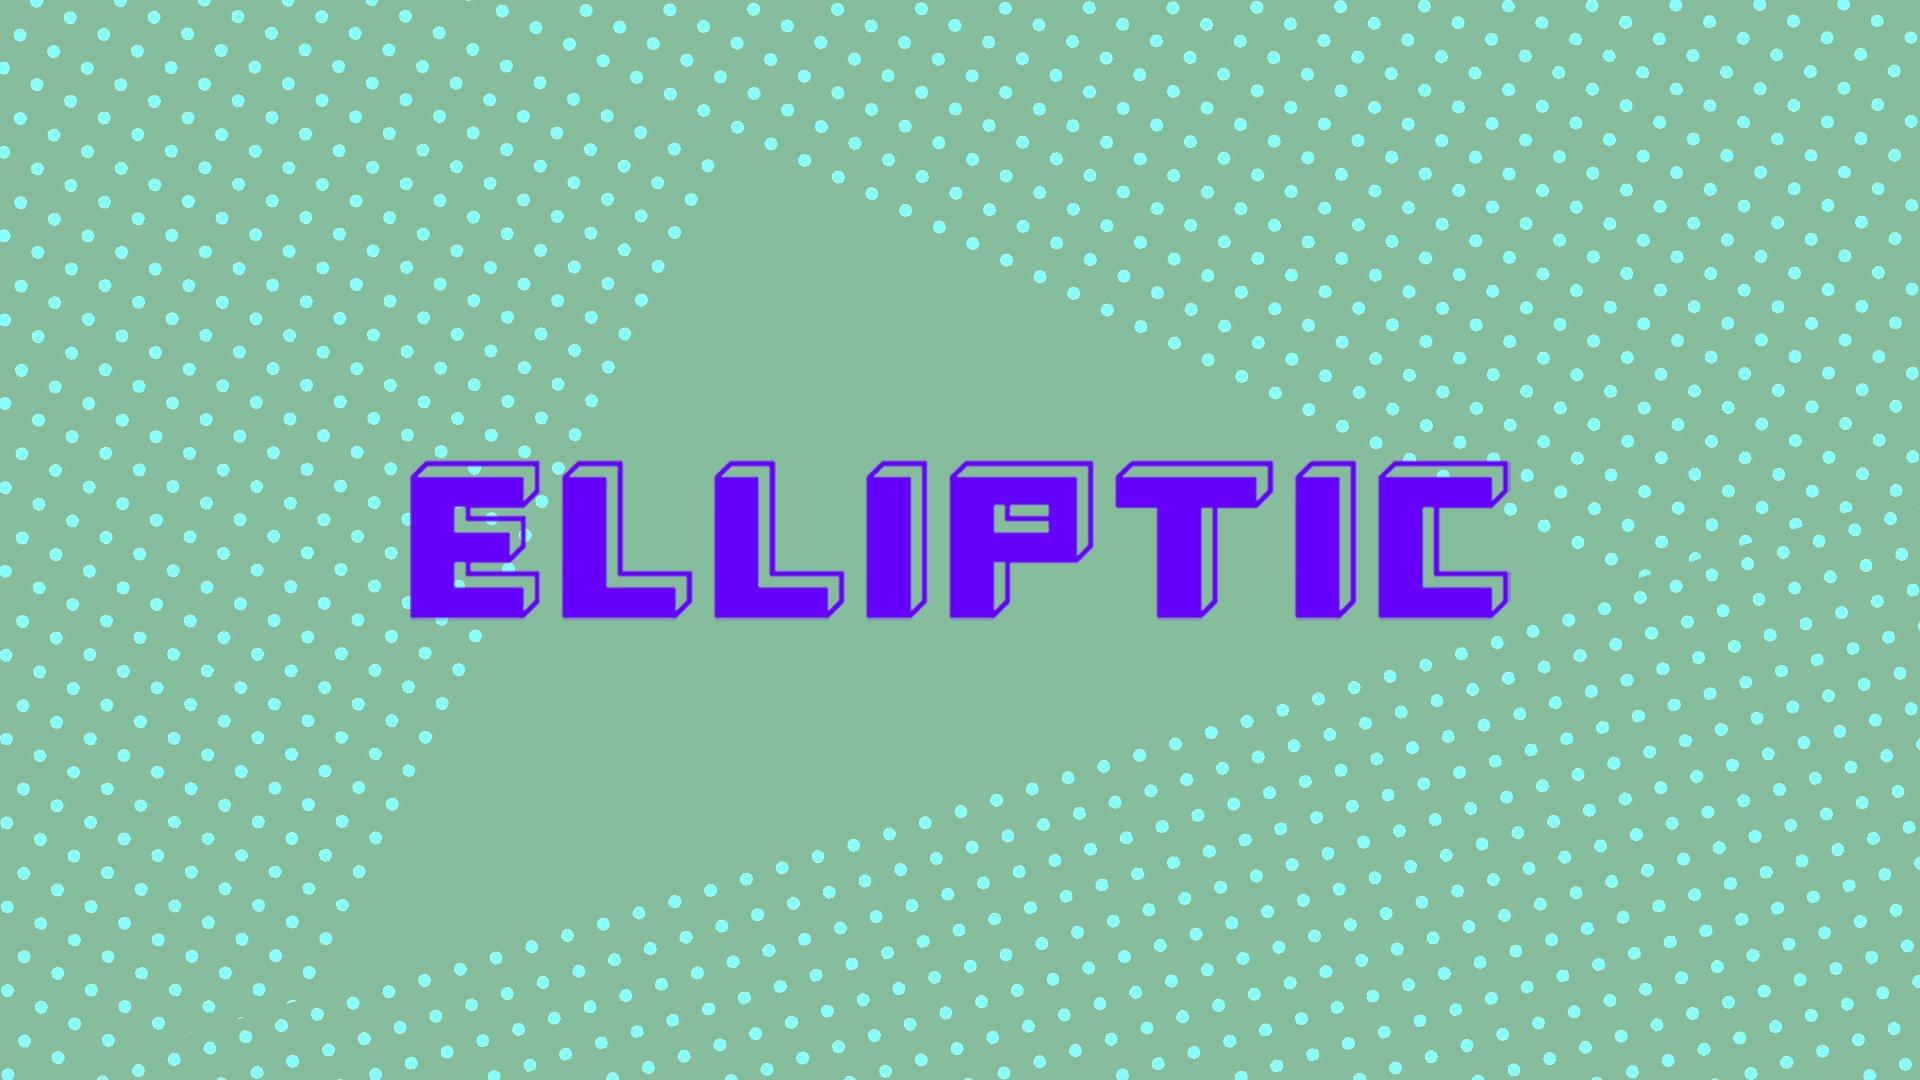 Blockchain analytics firm Elliptic raises $60 million in Series C funding